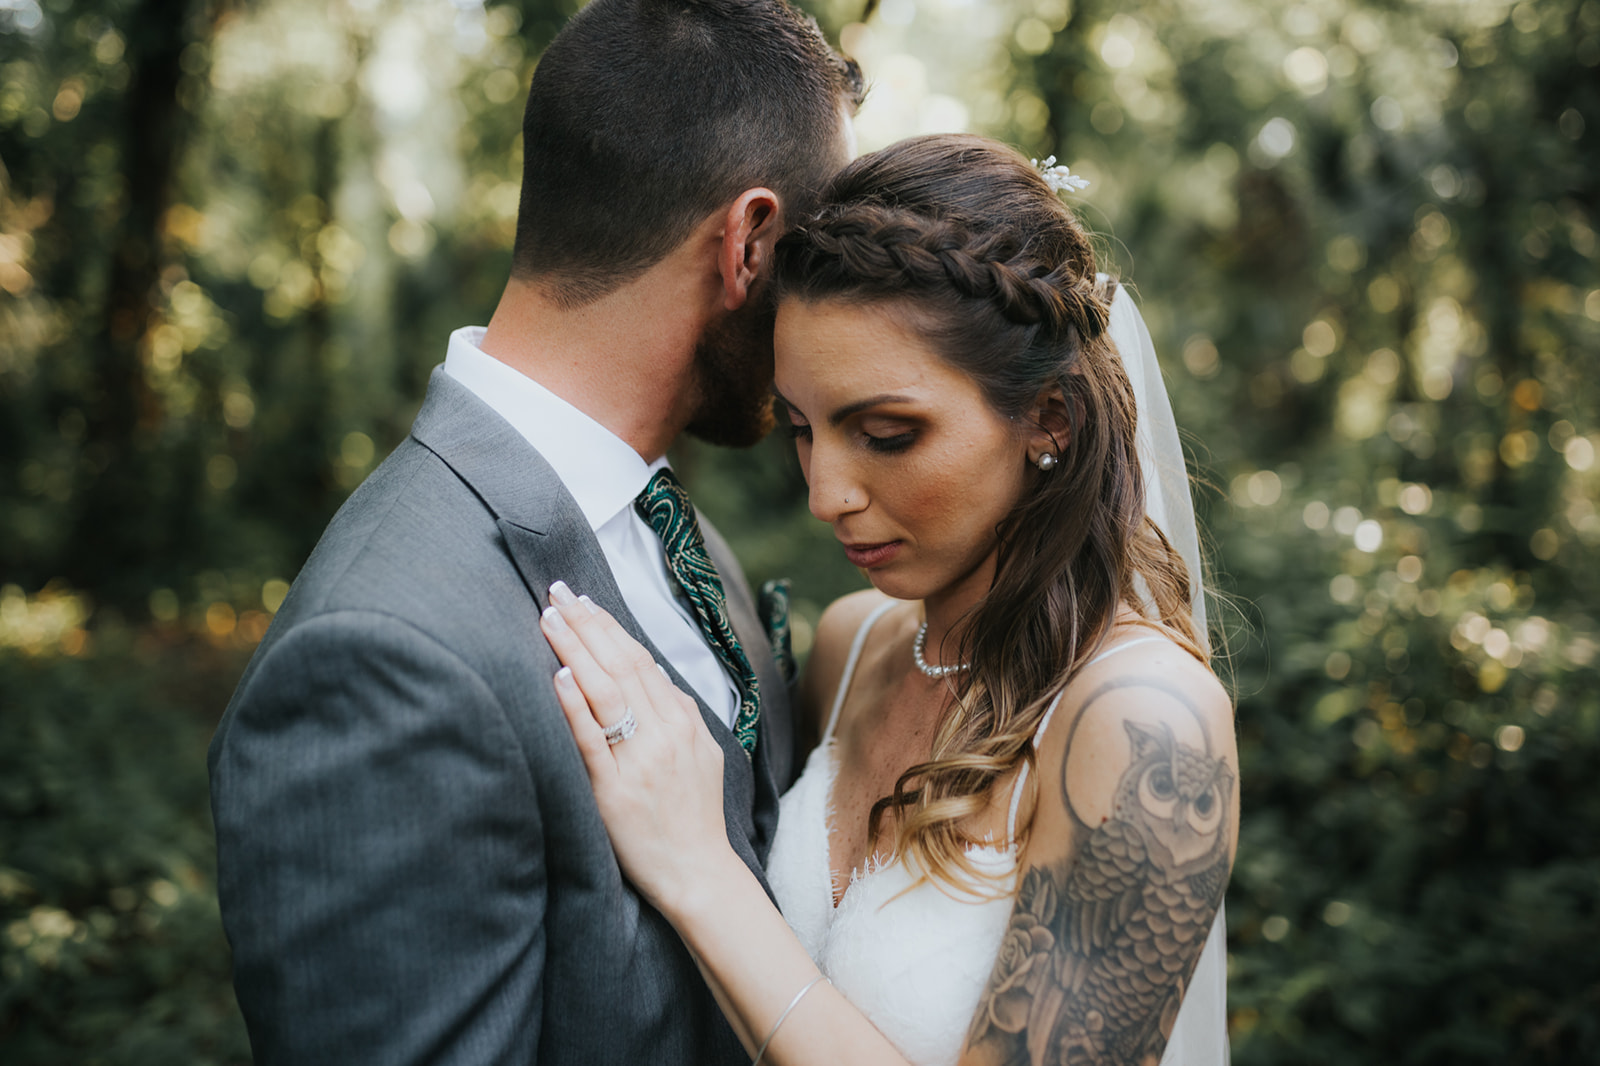 371Jacob_Darrian_Wedding_3-23-19_websize.jpg